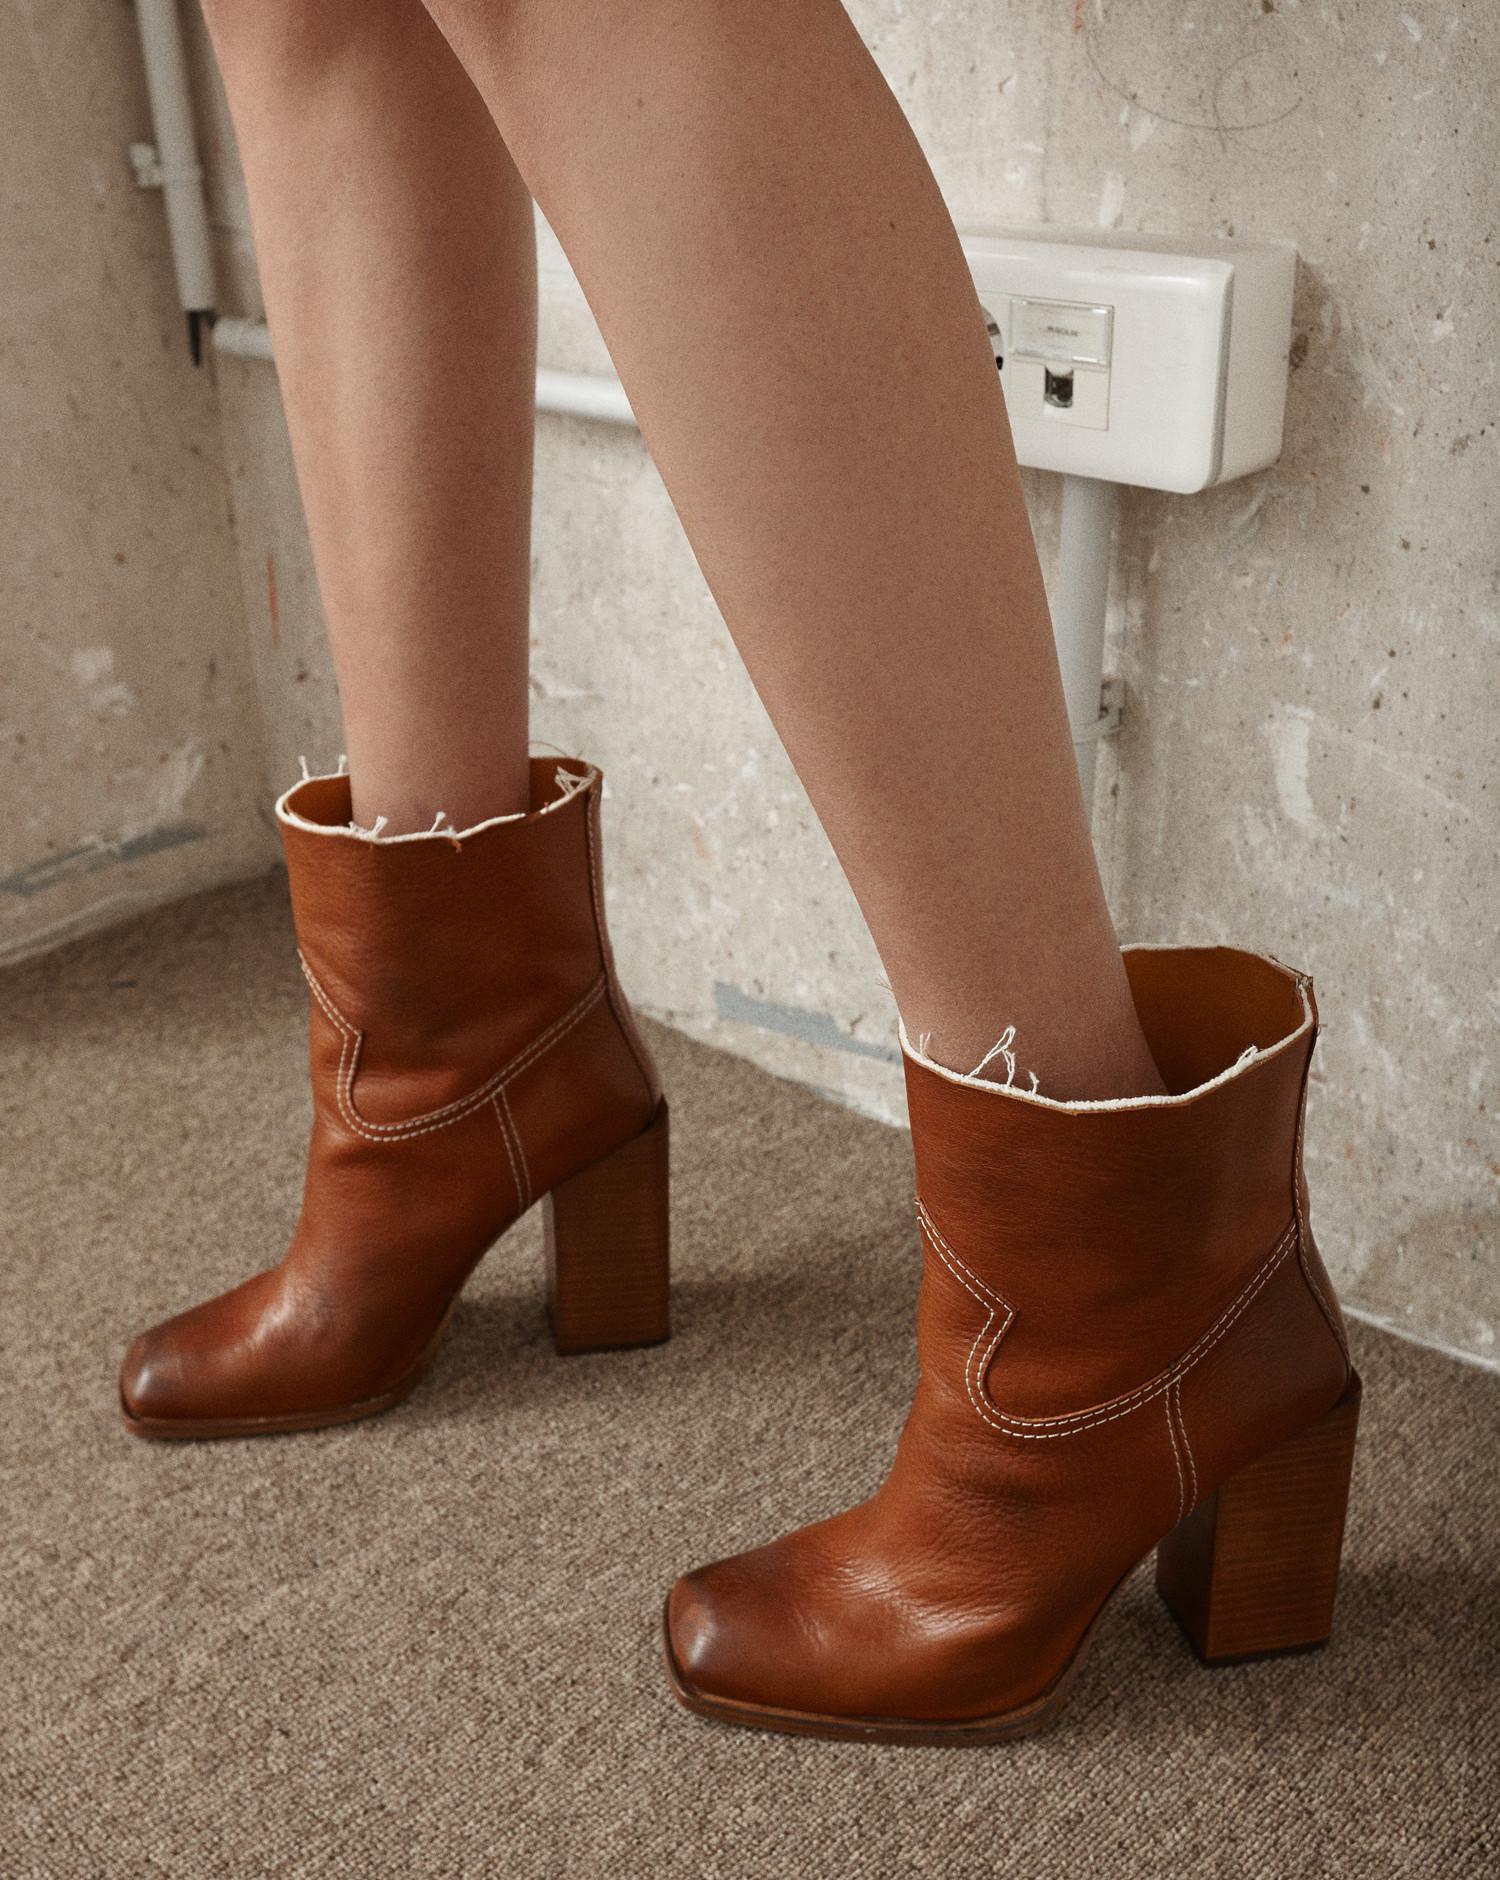 Limited Edition Online Buy Cheap Choice Saint Laurent Jodie square-toe leather ankle boots kt3UM5x4H